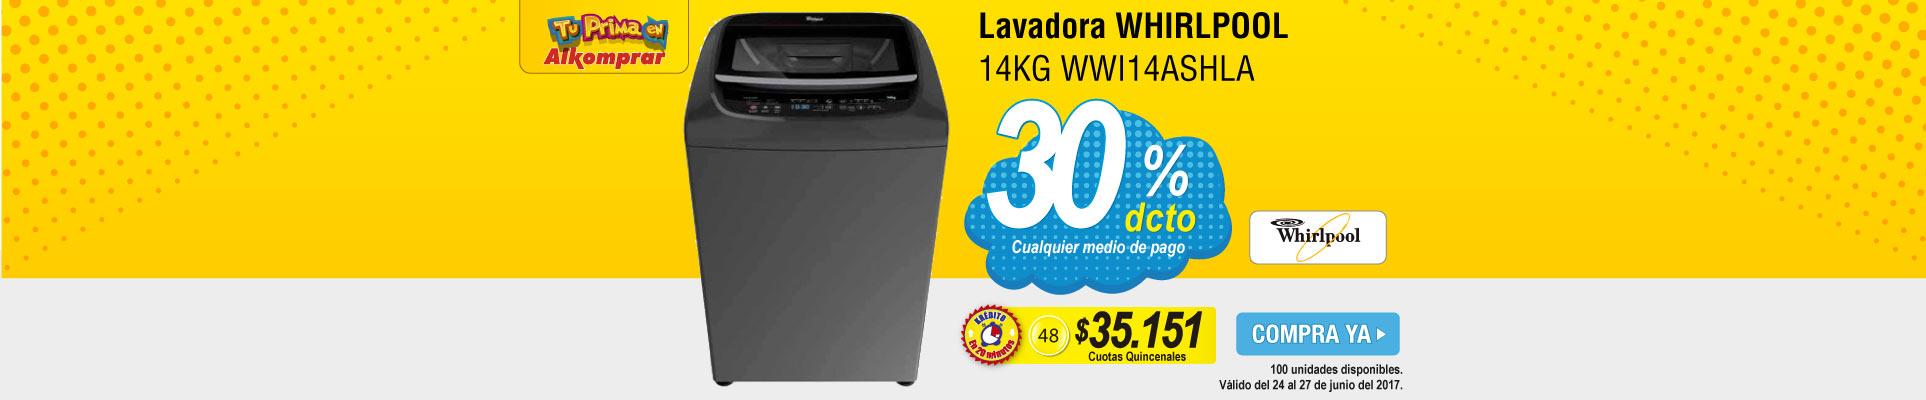 Lavadora WHIRLPOOL 14KG WWI14ASHLA - banner prinicipal